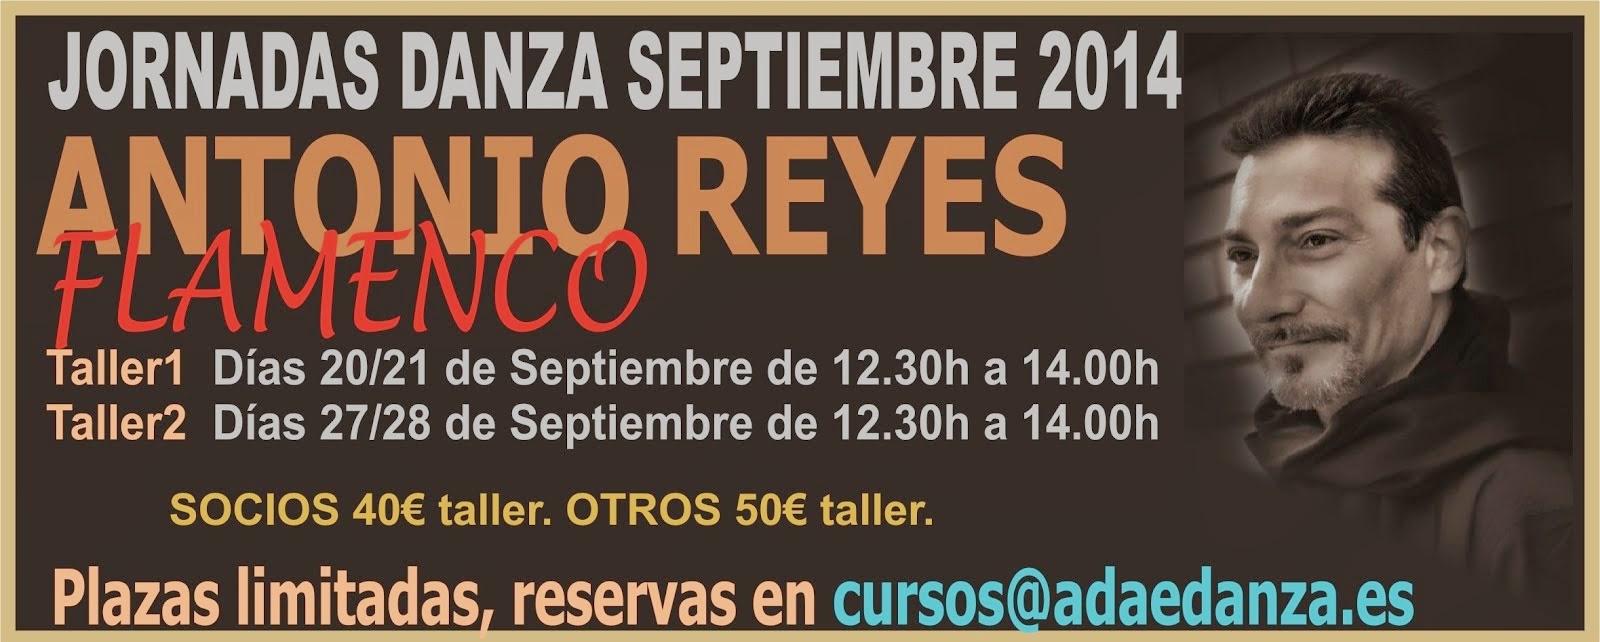 ANTONIO REYES - TALLER FLAMENCO.